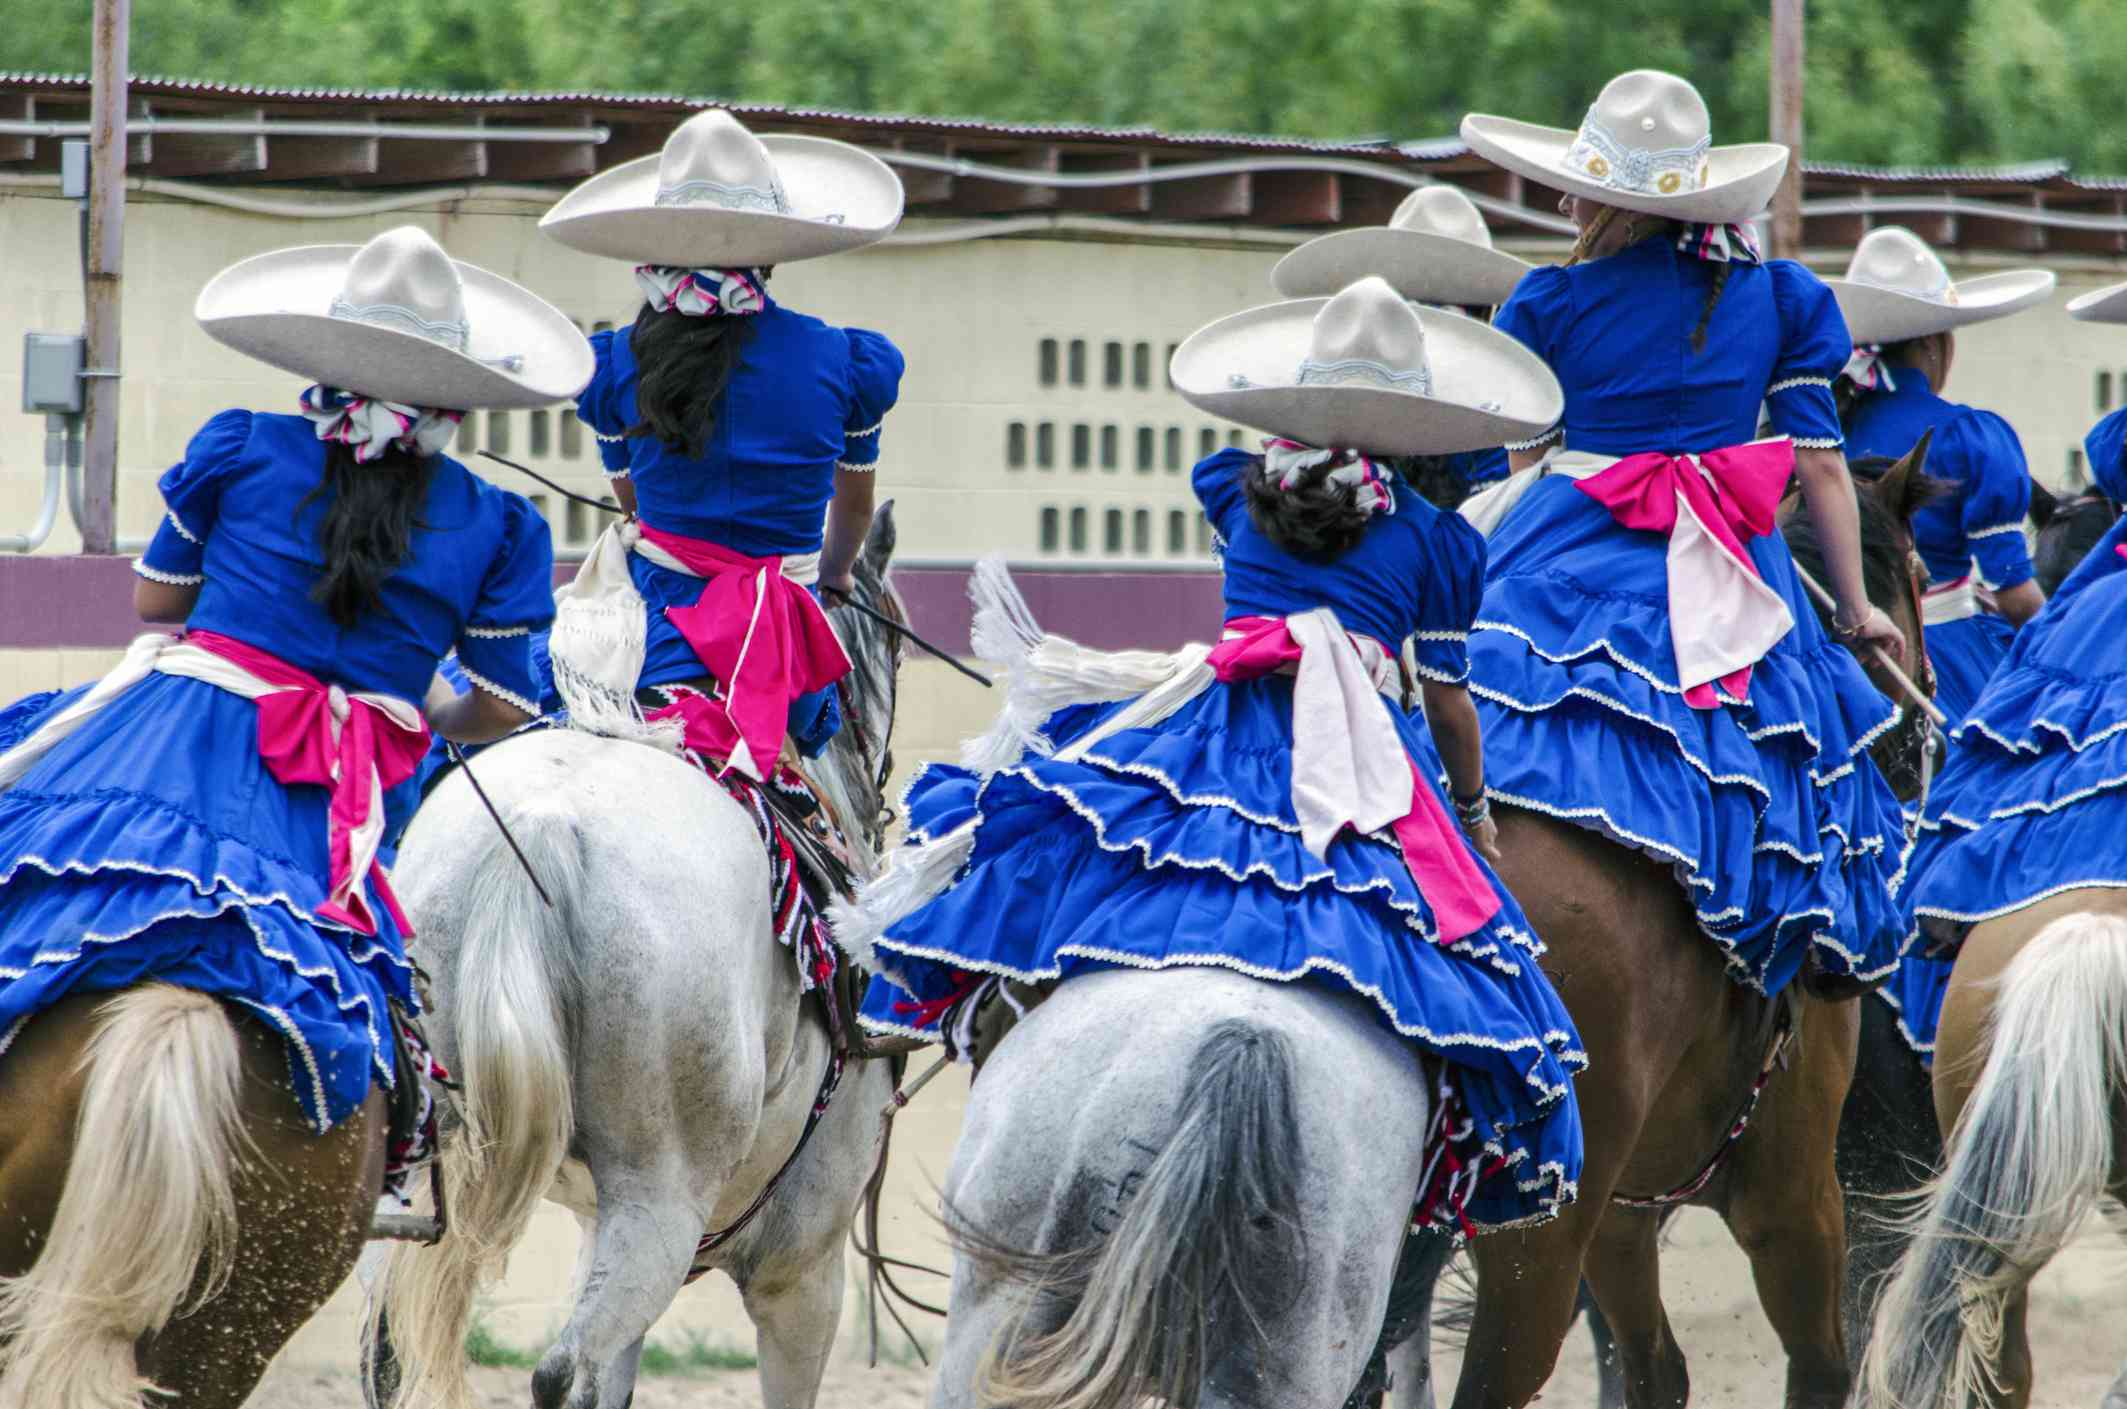 Escaramuzas on horseback in San Antonio